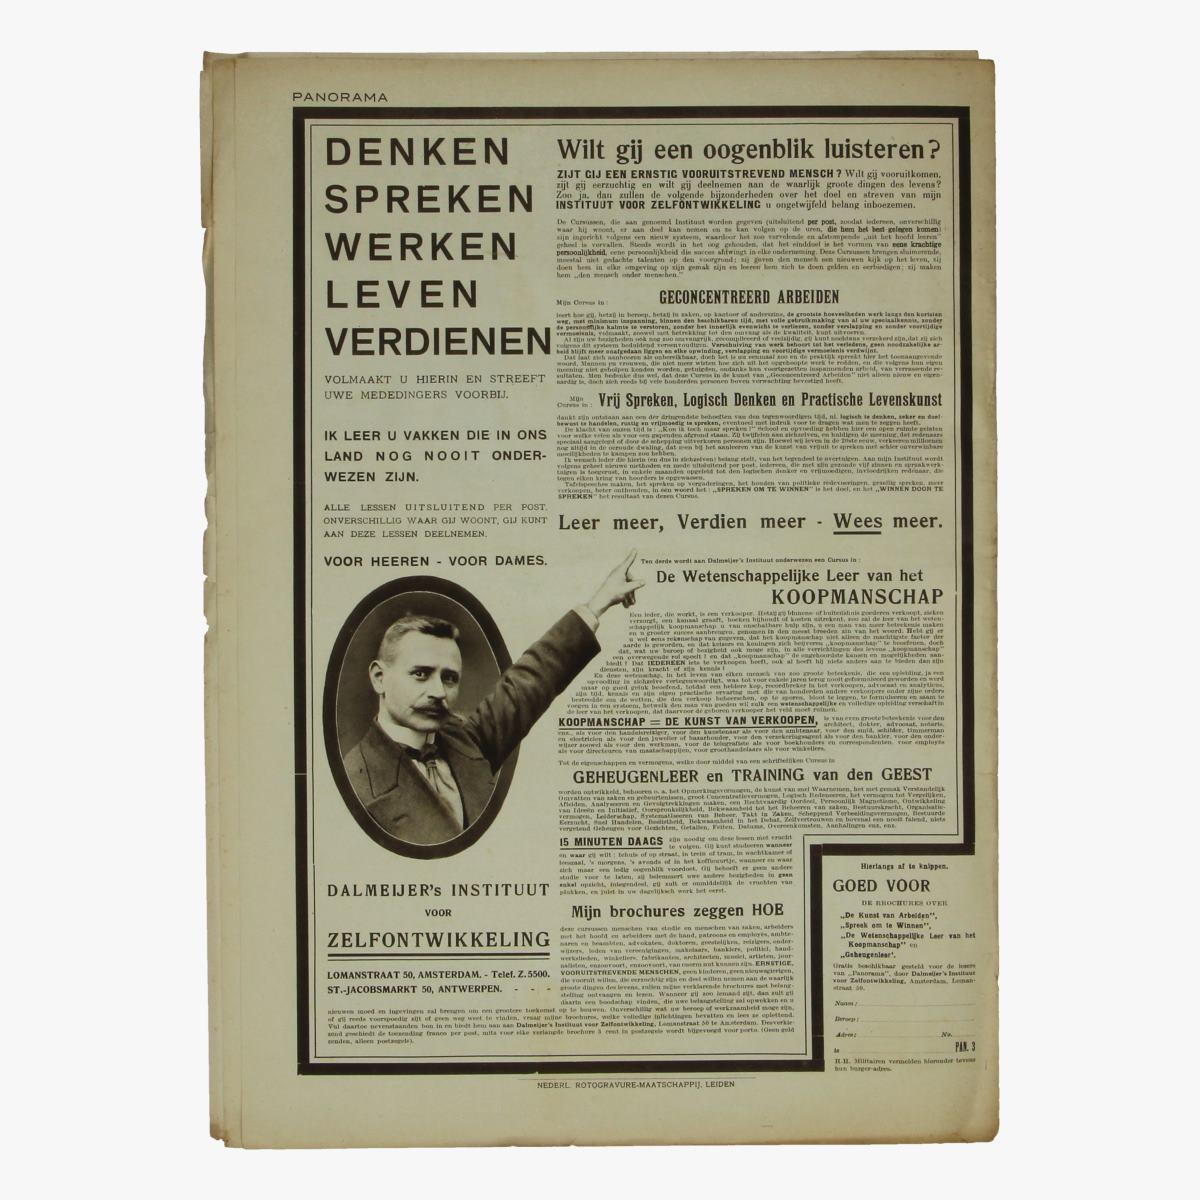 Afbeeldingen van oude weekblad panorama N° 52  28 juni 1915